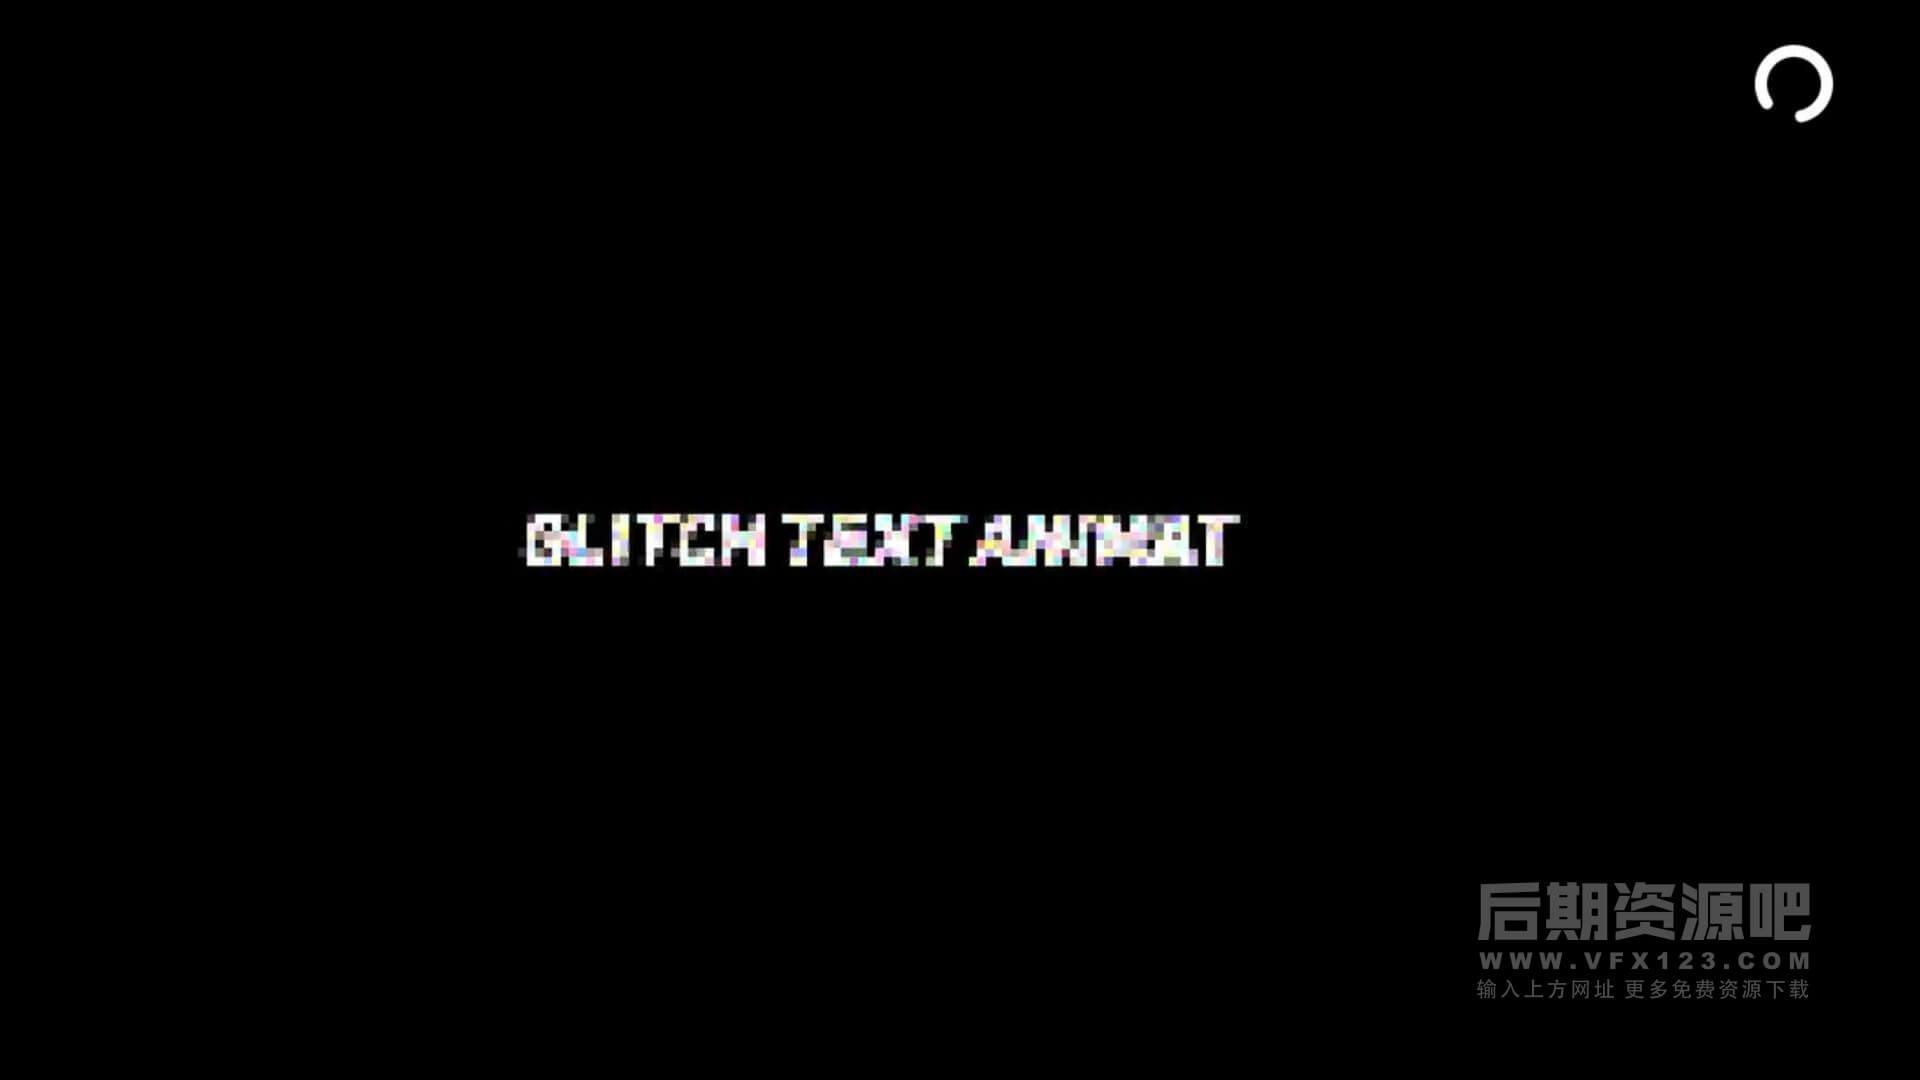 Fcpx插件 信号干扰故障文字标题效果制作工具 Glitch Text Animations